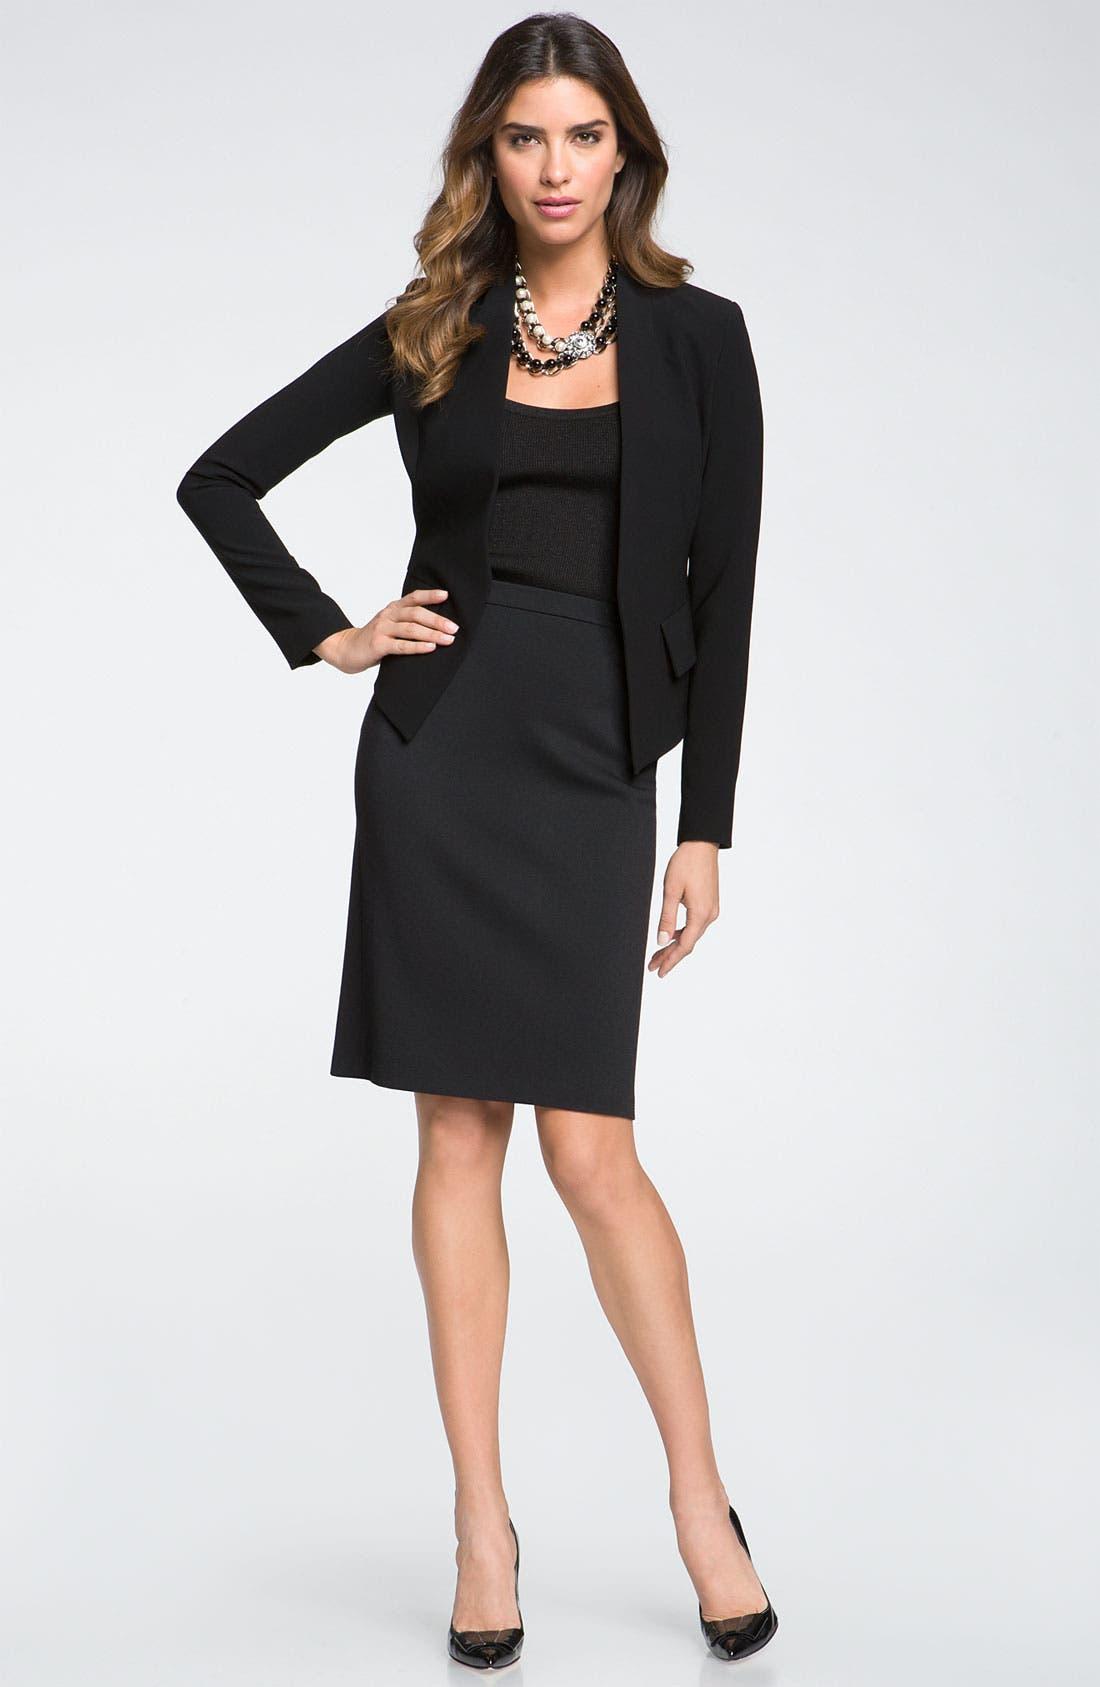 Main Image - St. John Collection Jacket & Skirt